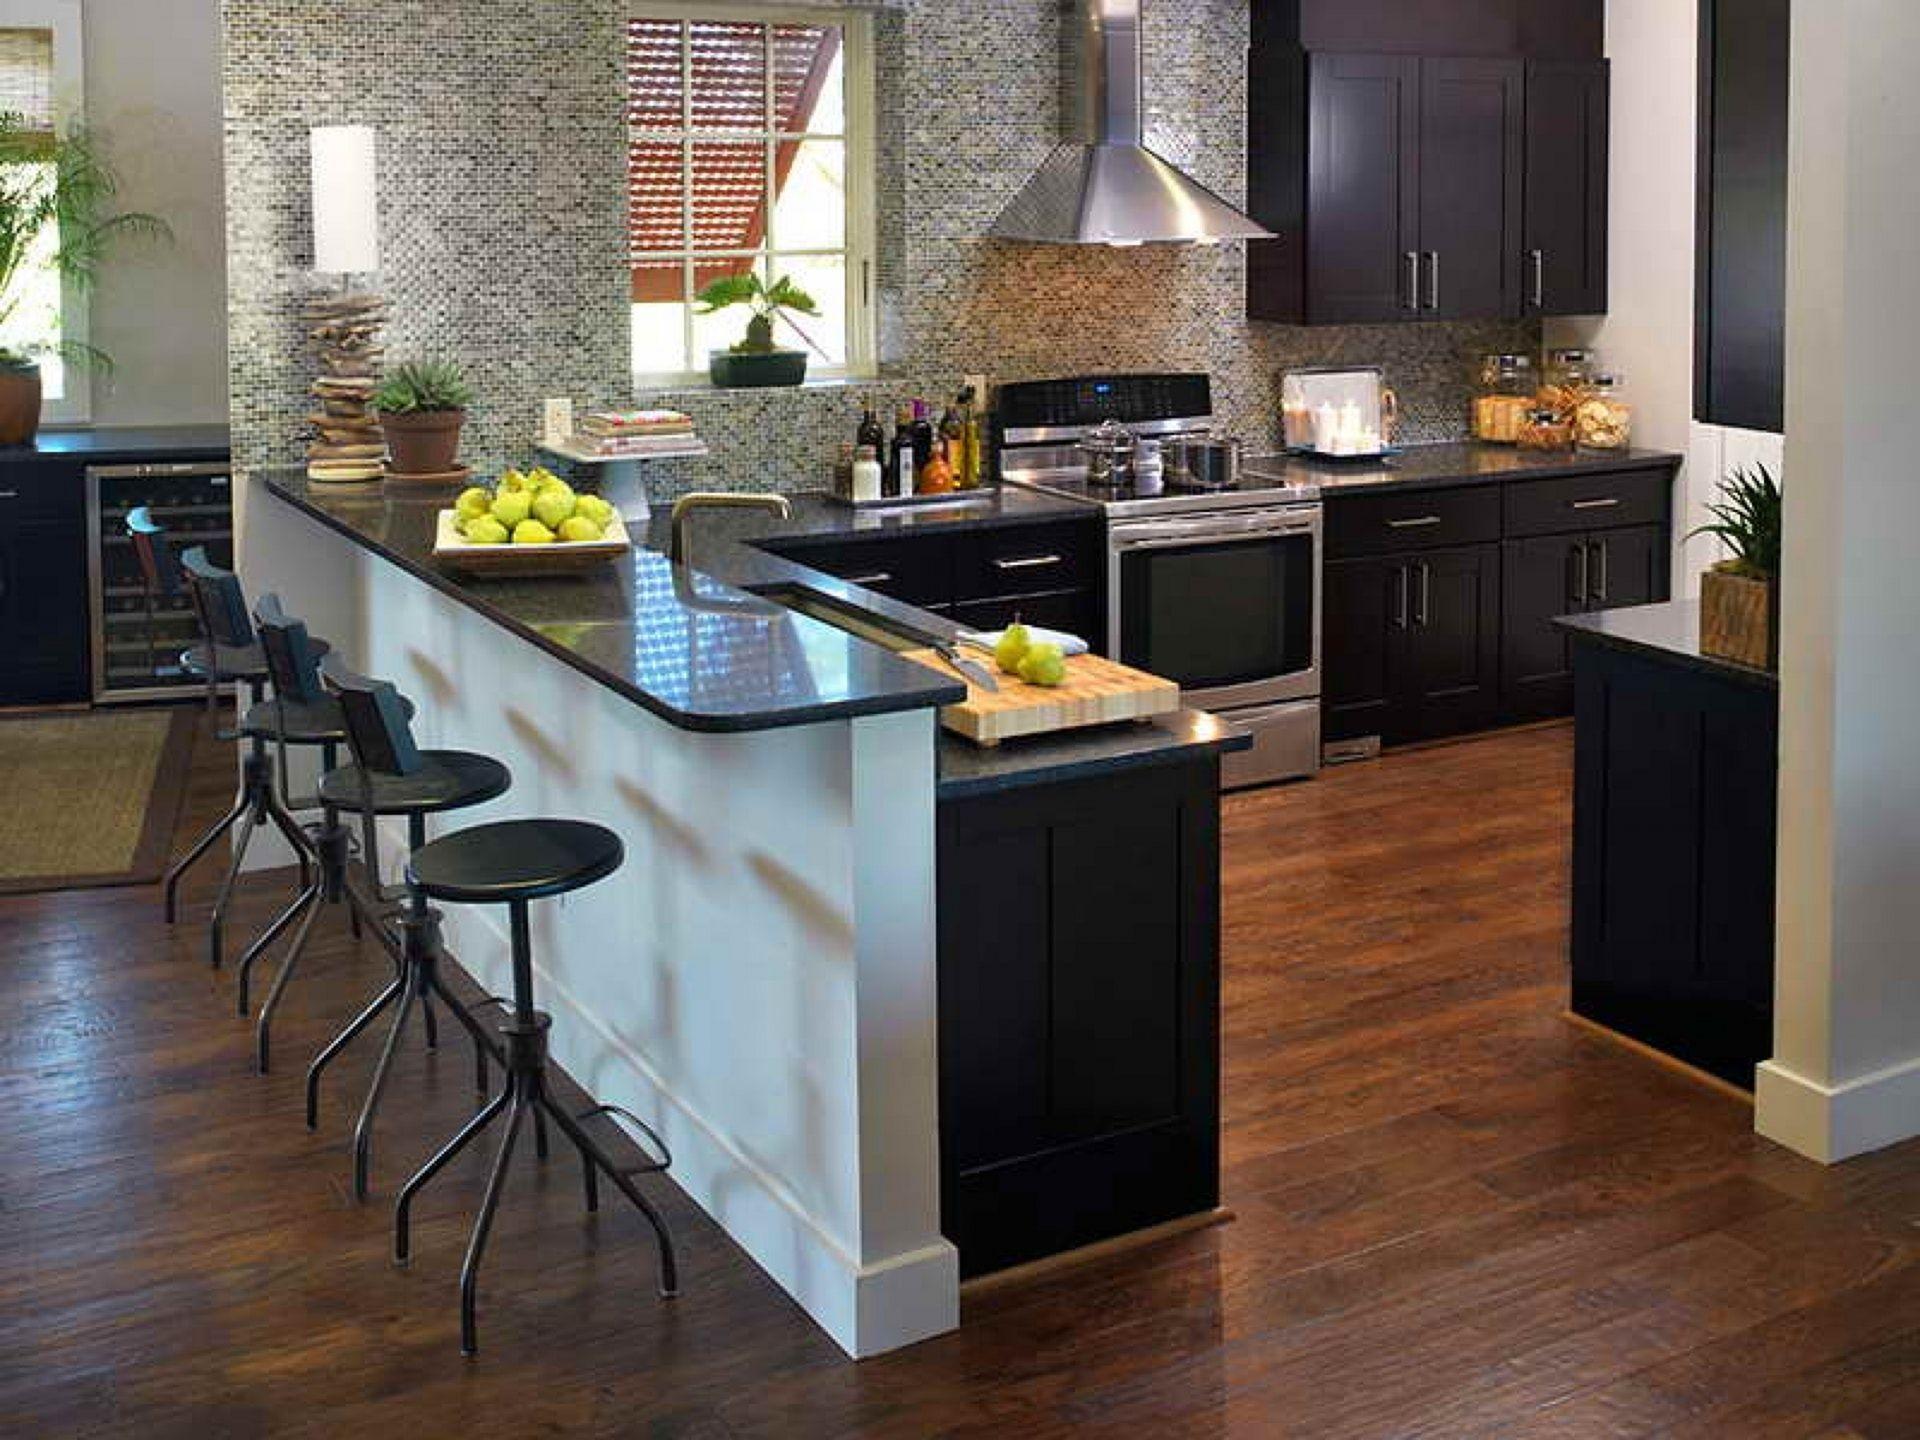 27 Fabulous Home Mini Bar Kitchen Designs For Amazing Kitchen Idea Kitchen Bar Design Kitchen Design Small Kitchen Remodel Small